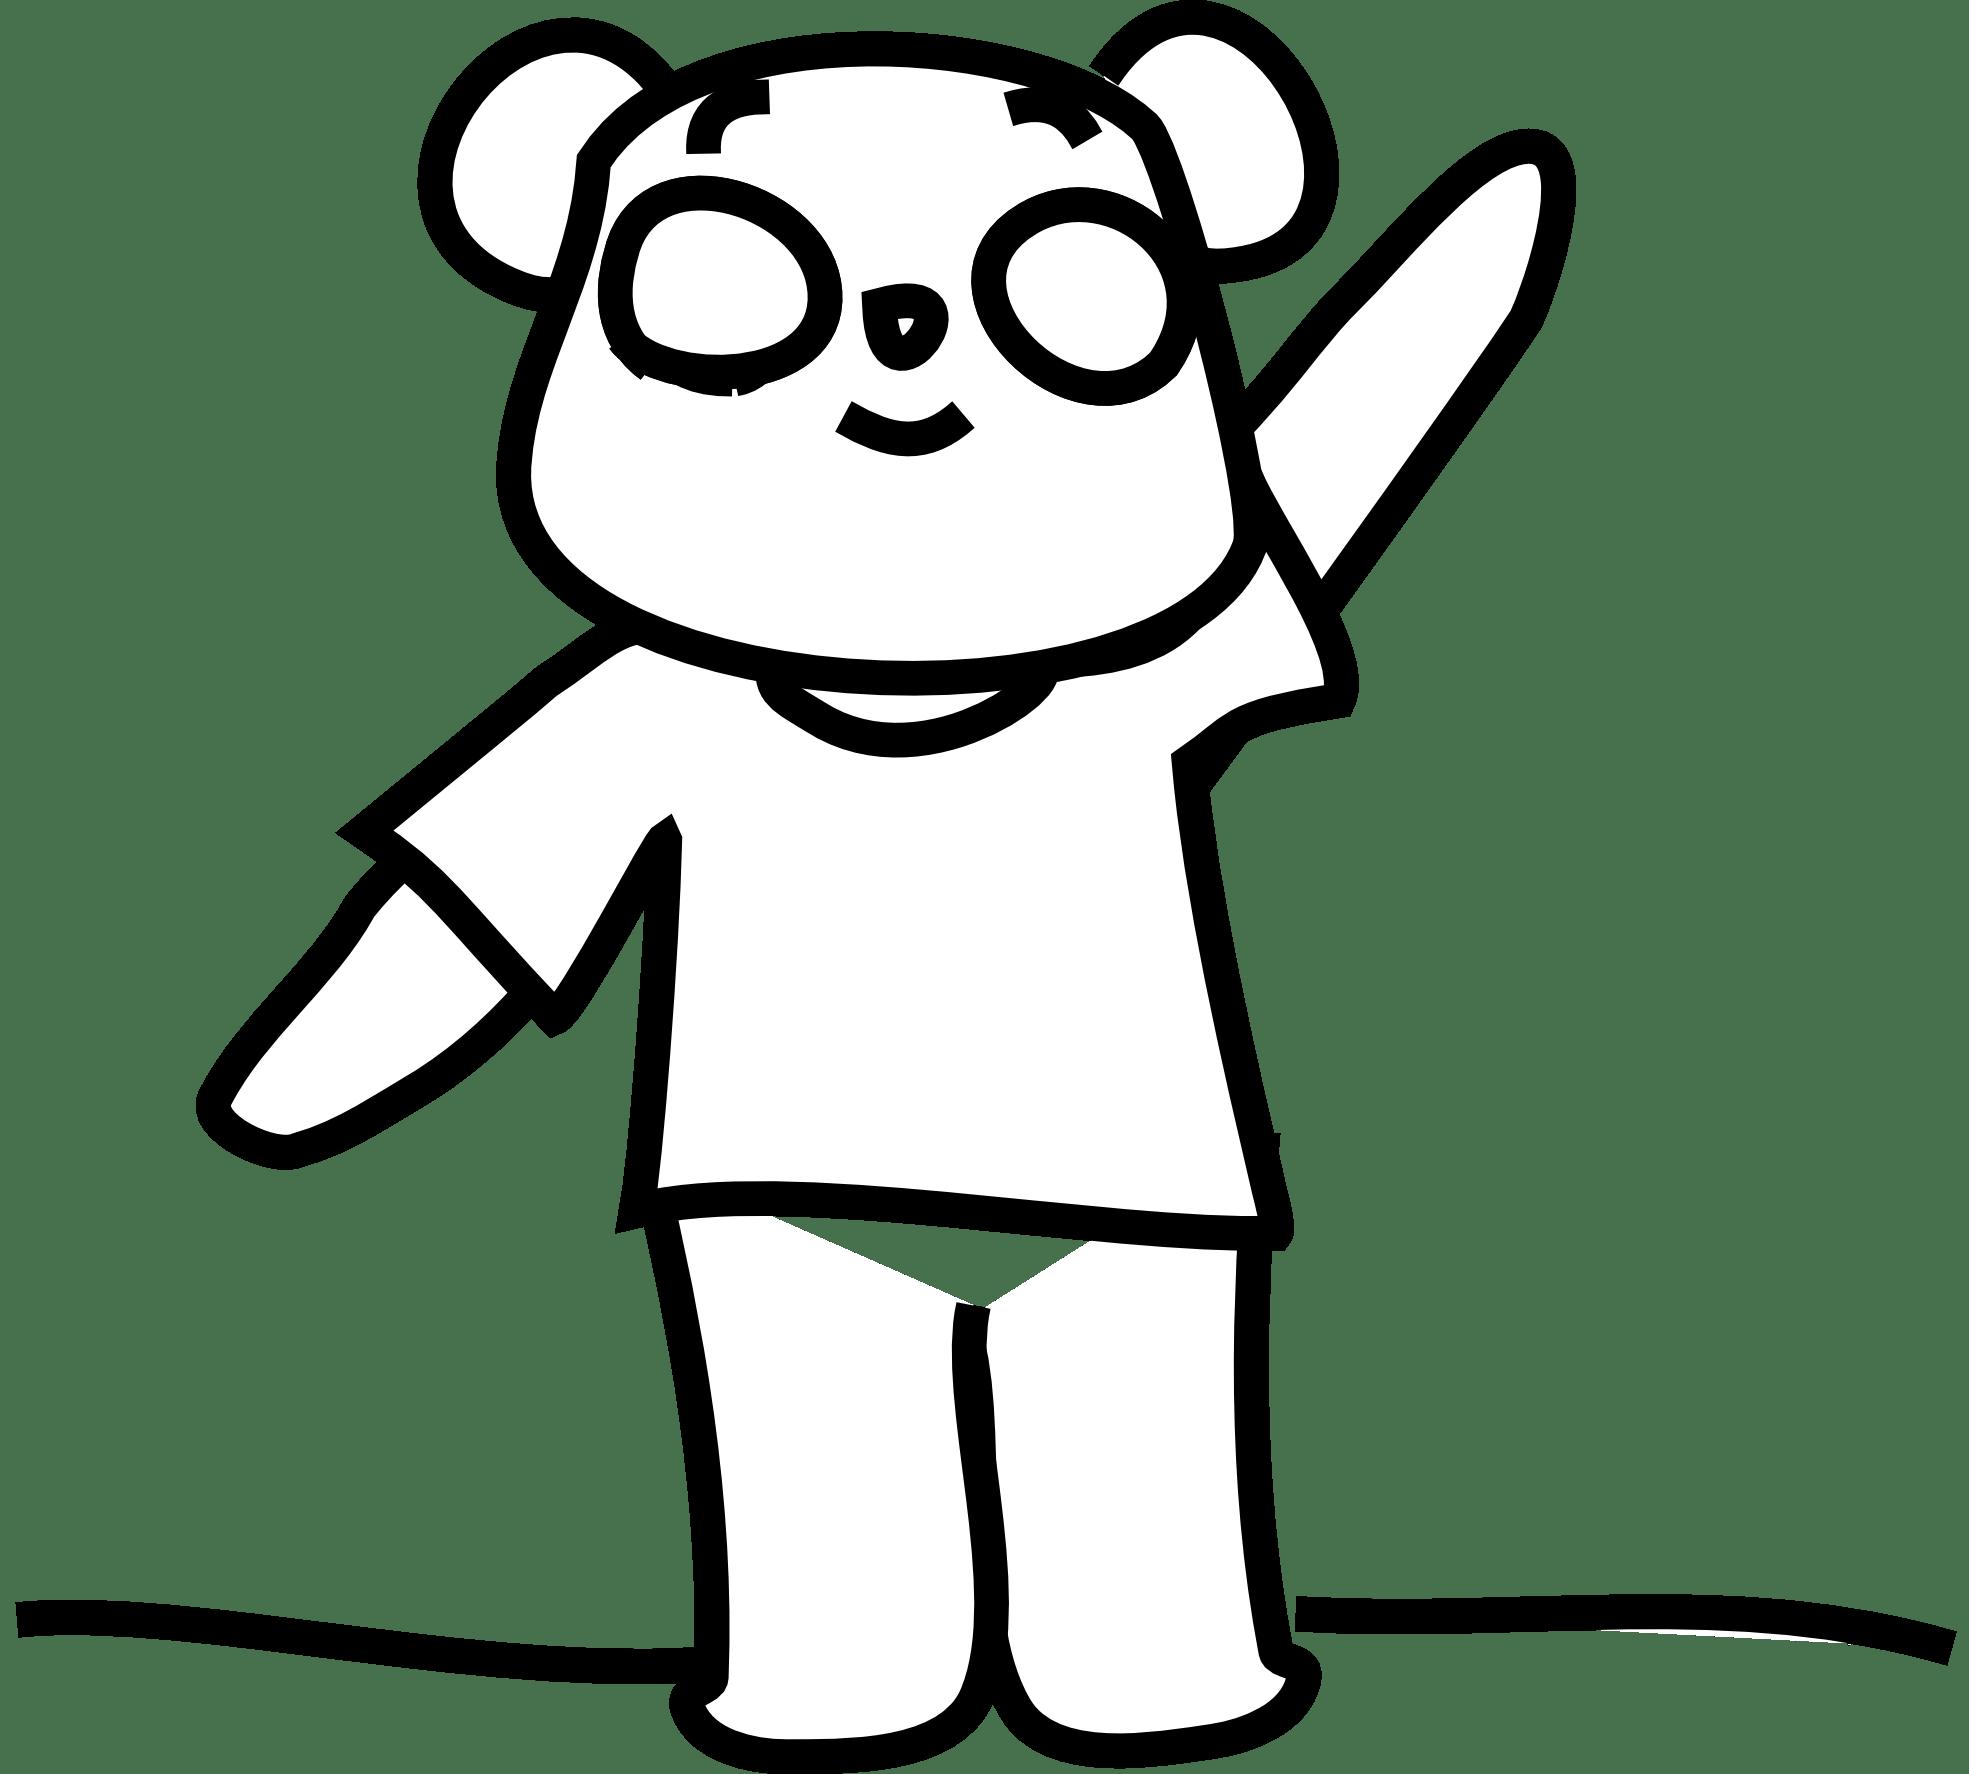 Teddy Bear Clip Art Black And White